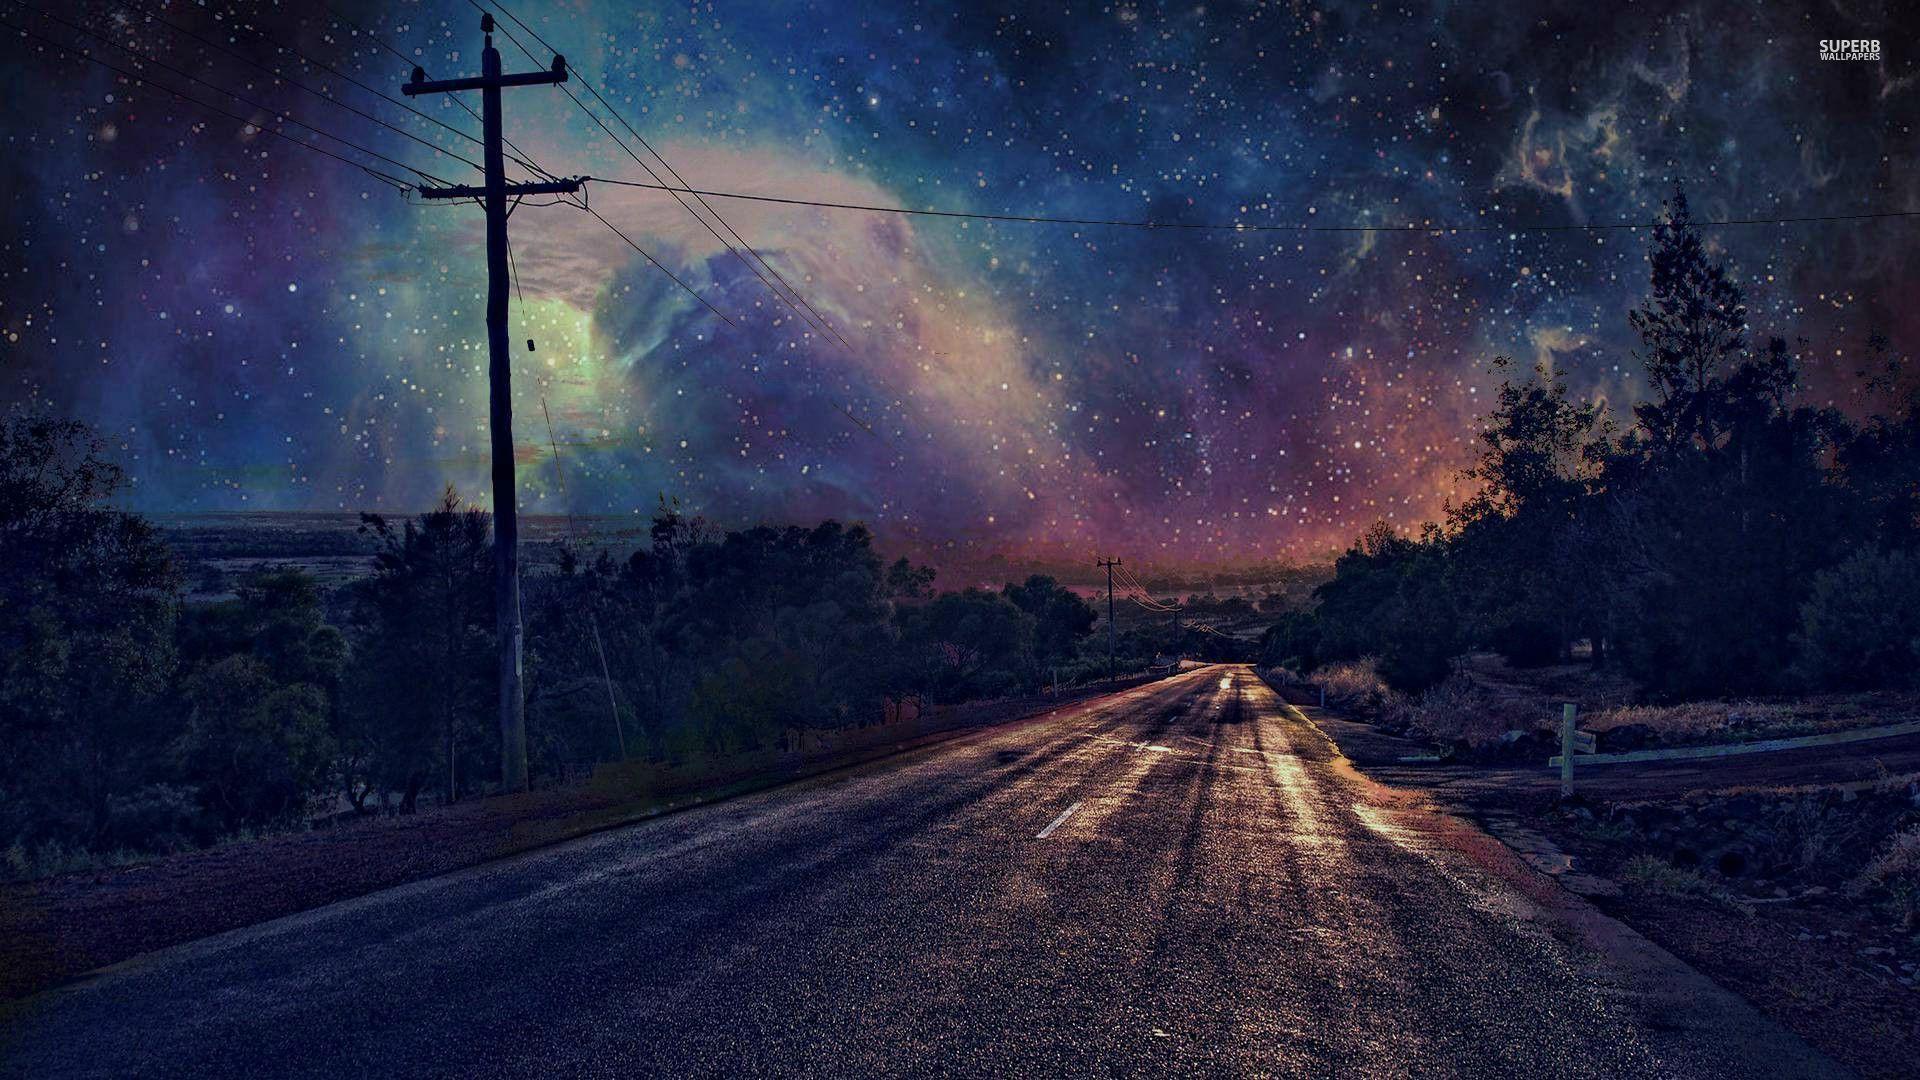 Milky Way on the Night Sky Wallpapers · 4K HD Desktop ...